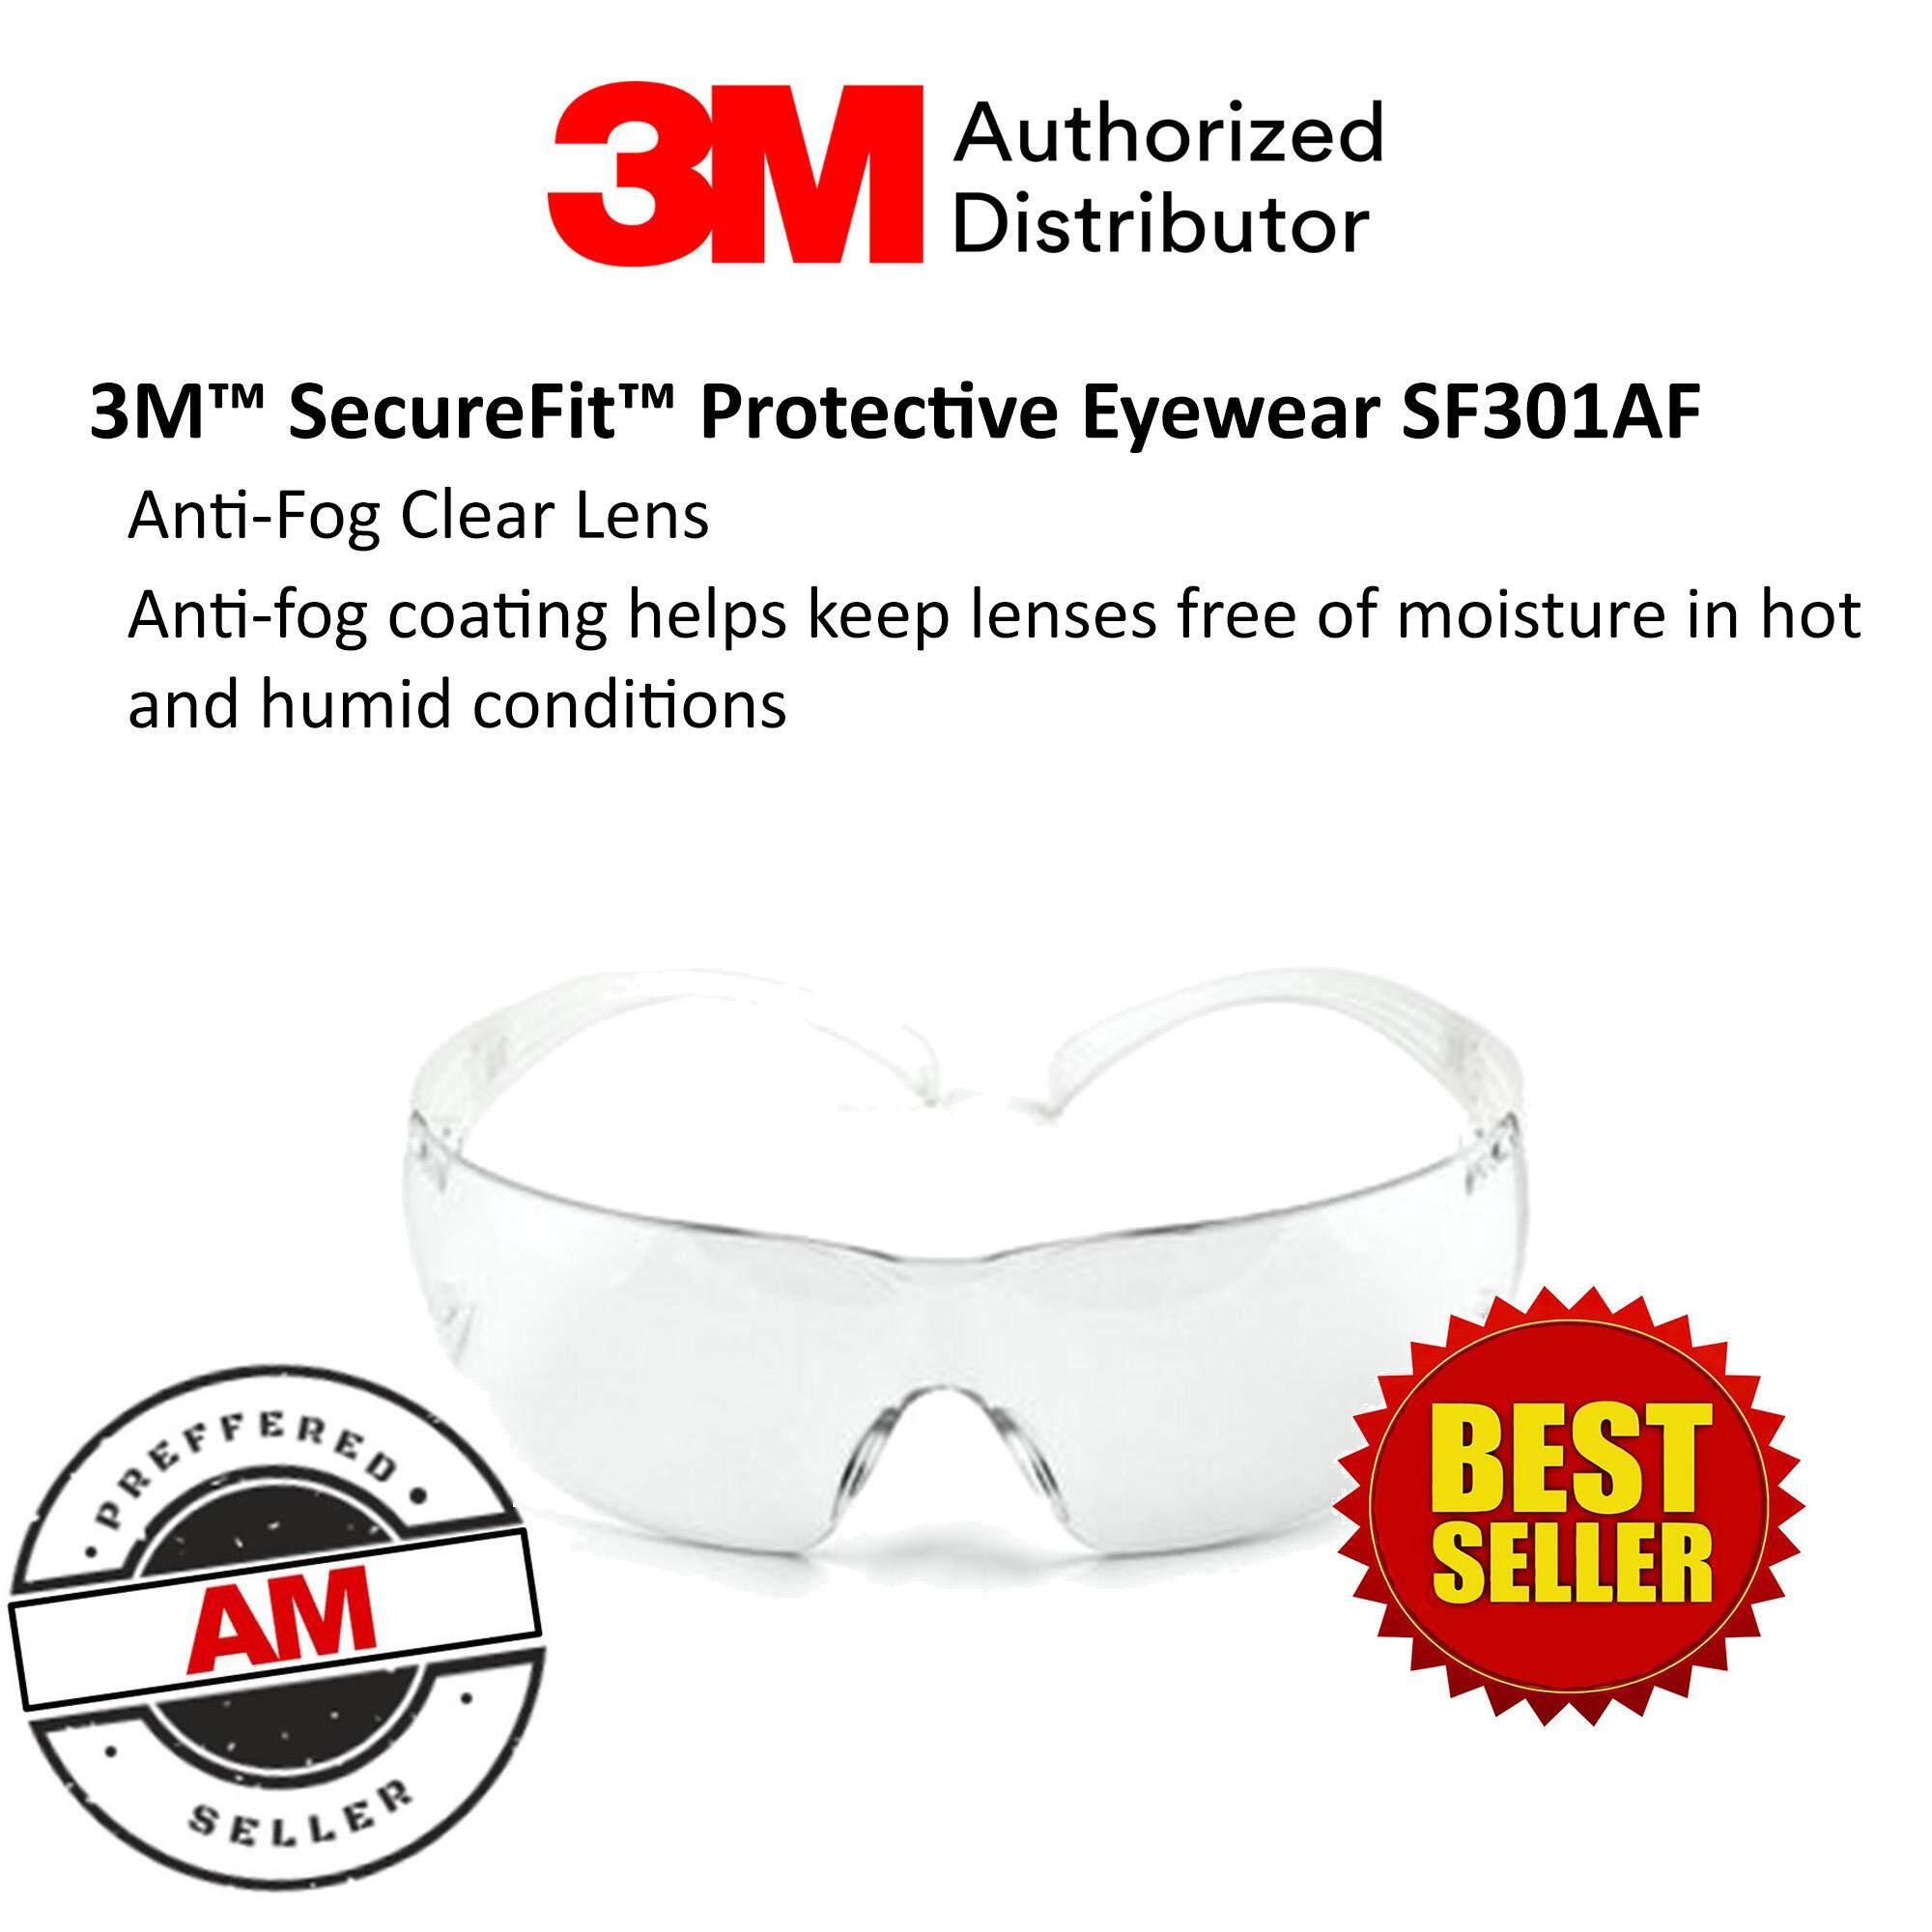 3M™ SecureFit™ Protective Eyewear SF301AF, Clear Lens